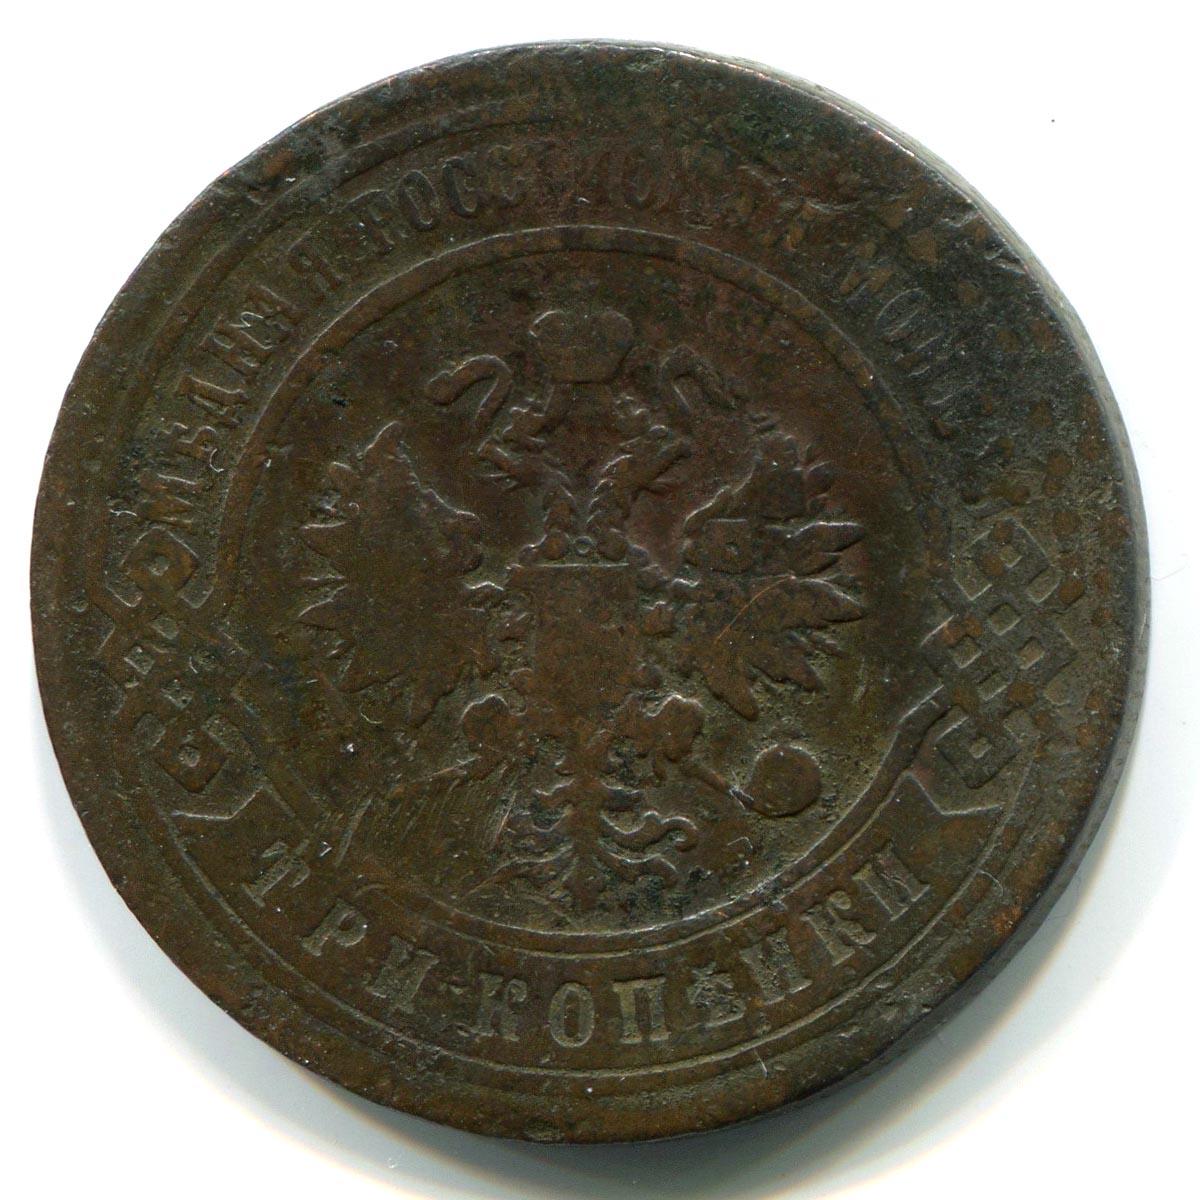 Сколько стоит 3 копейки 1898 года цена патина ударение